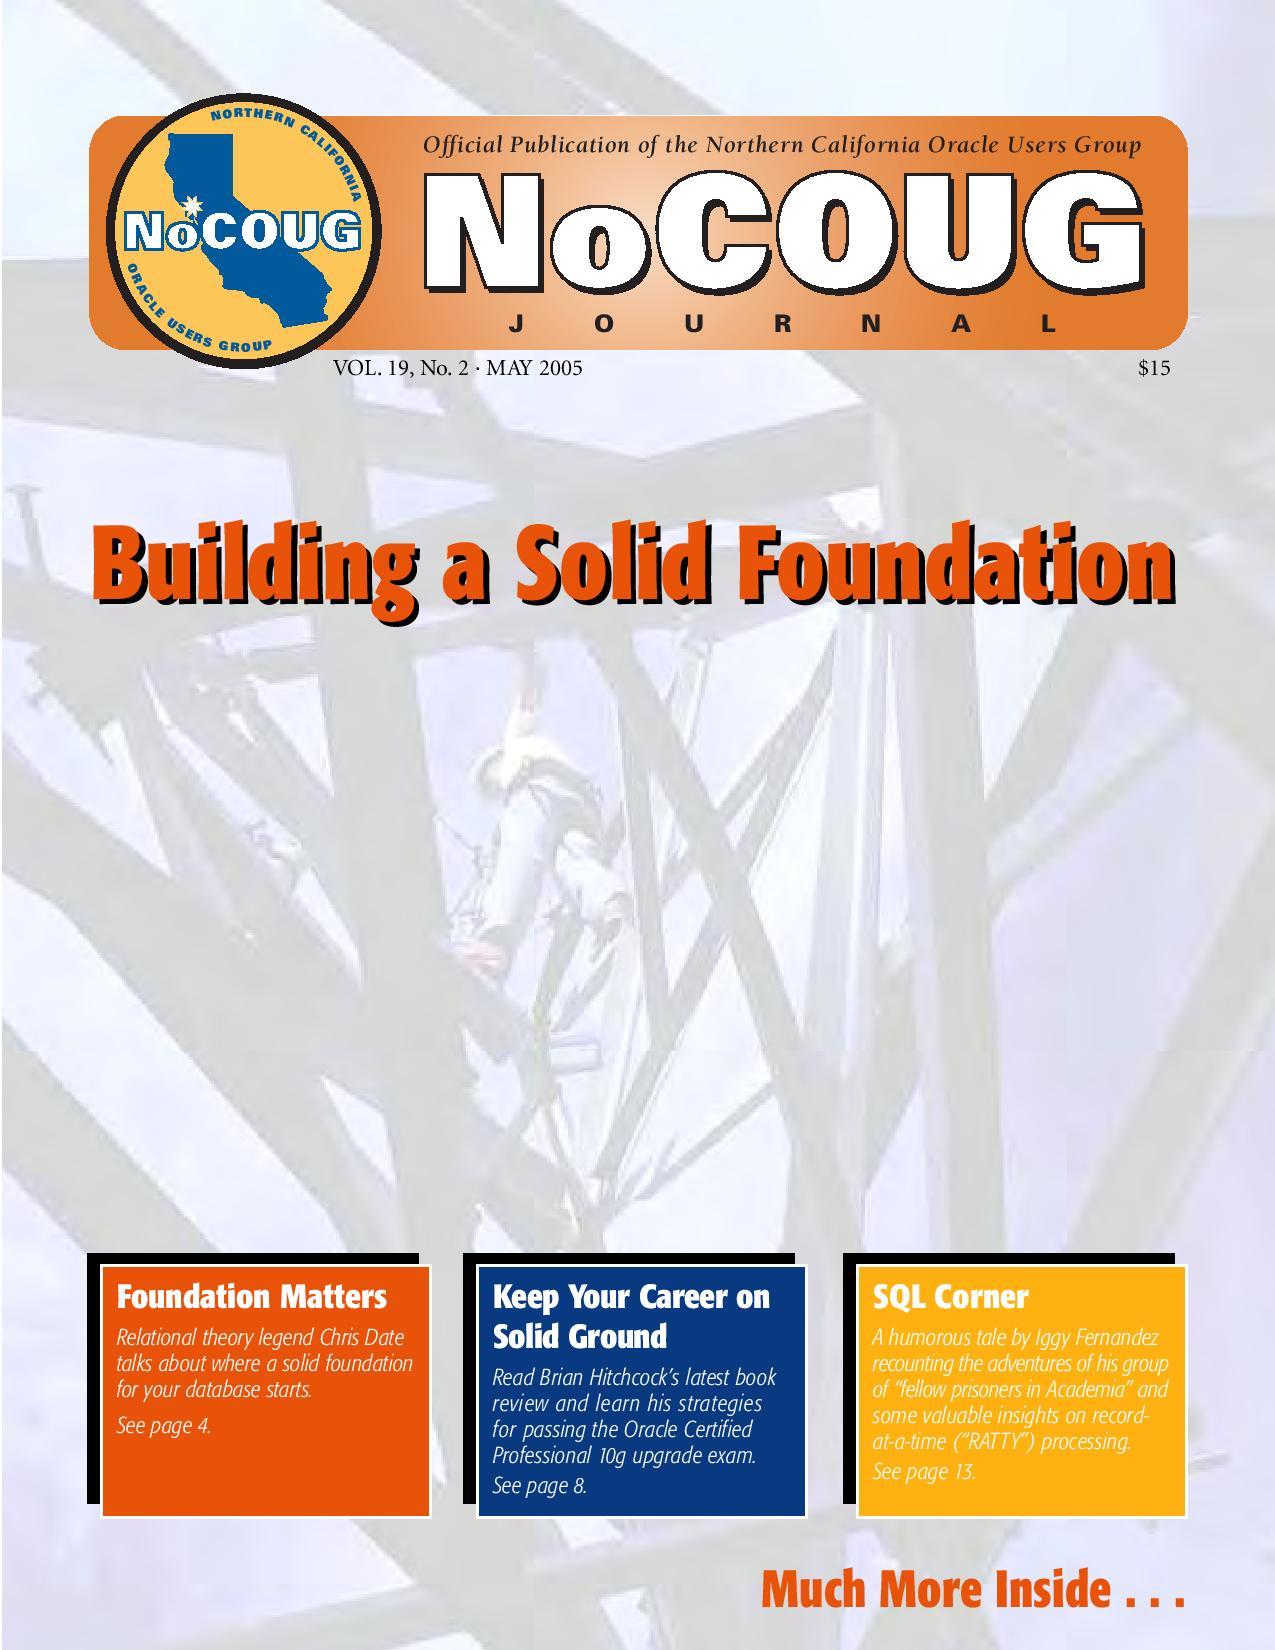 NoCOUG Journal 2005 05